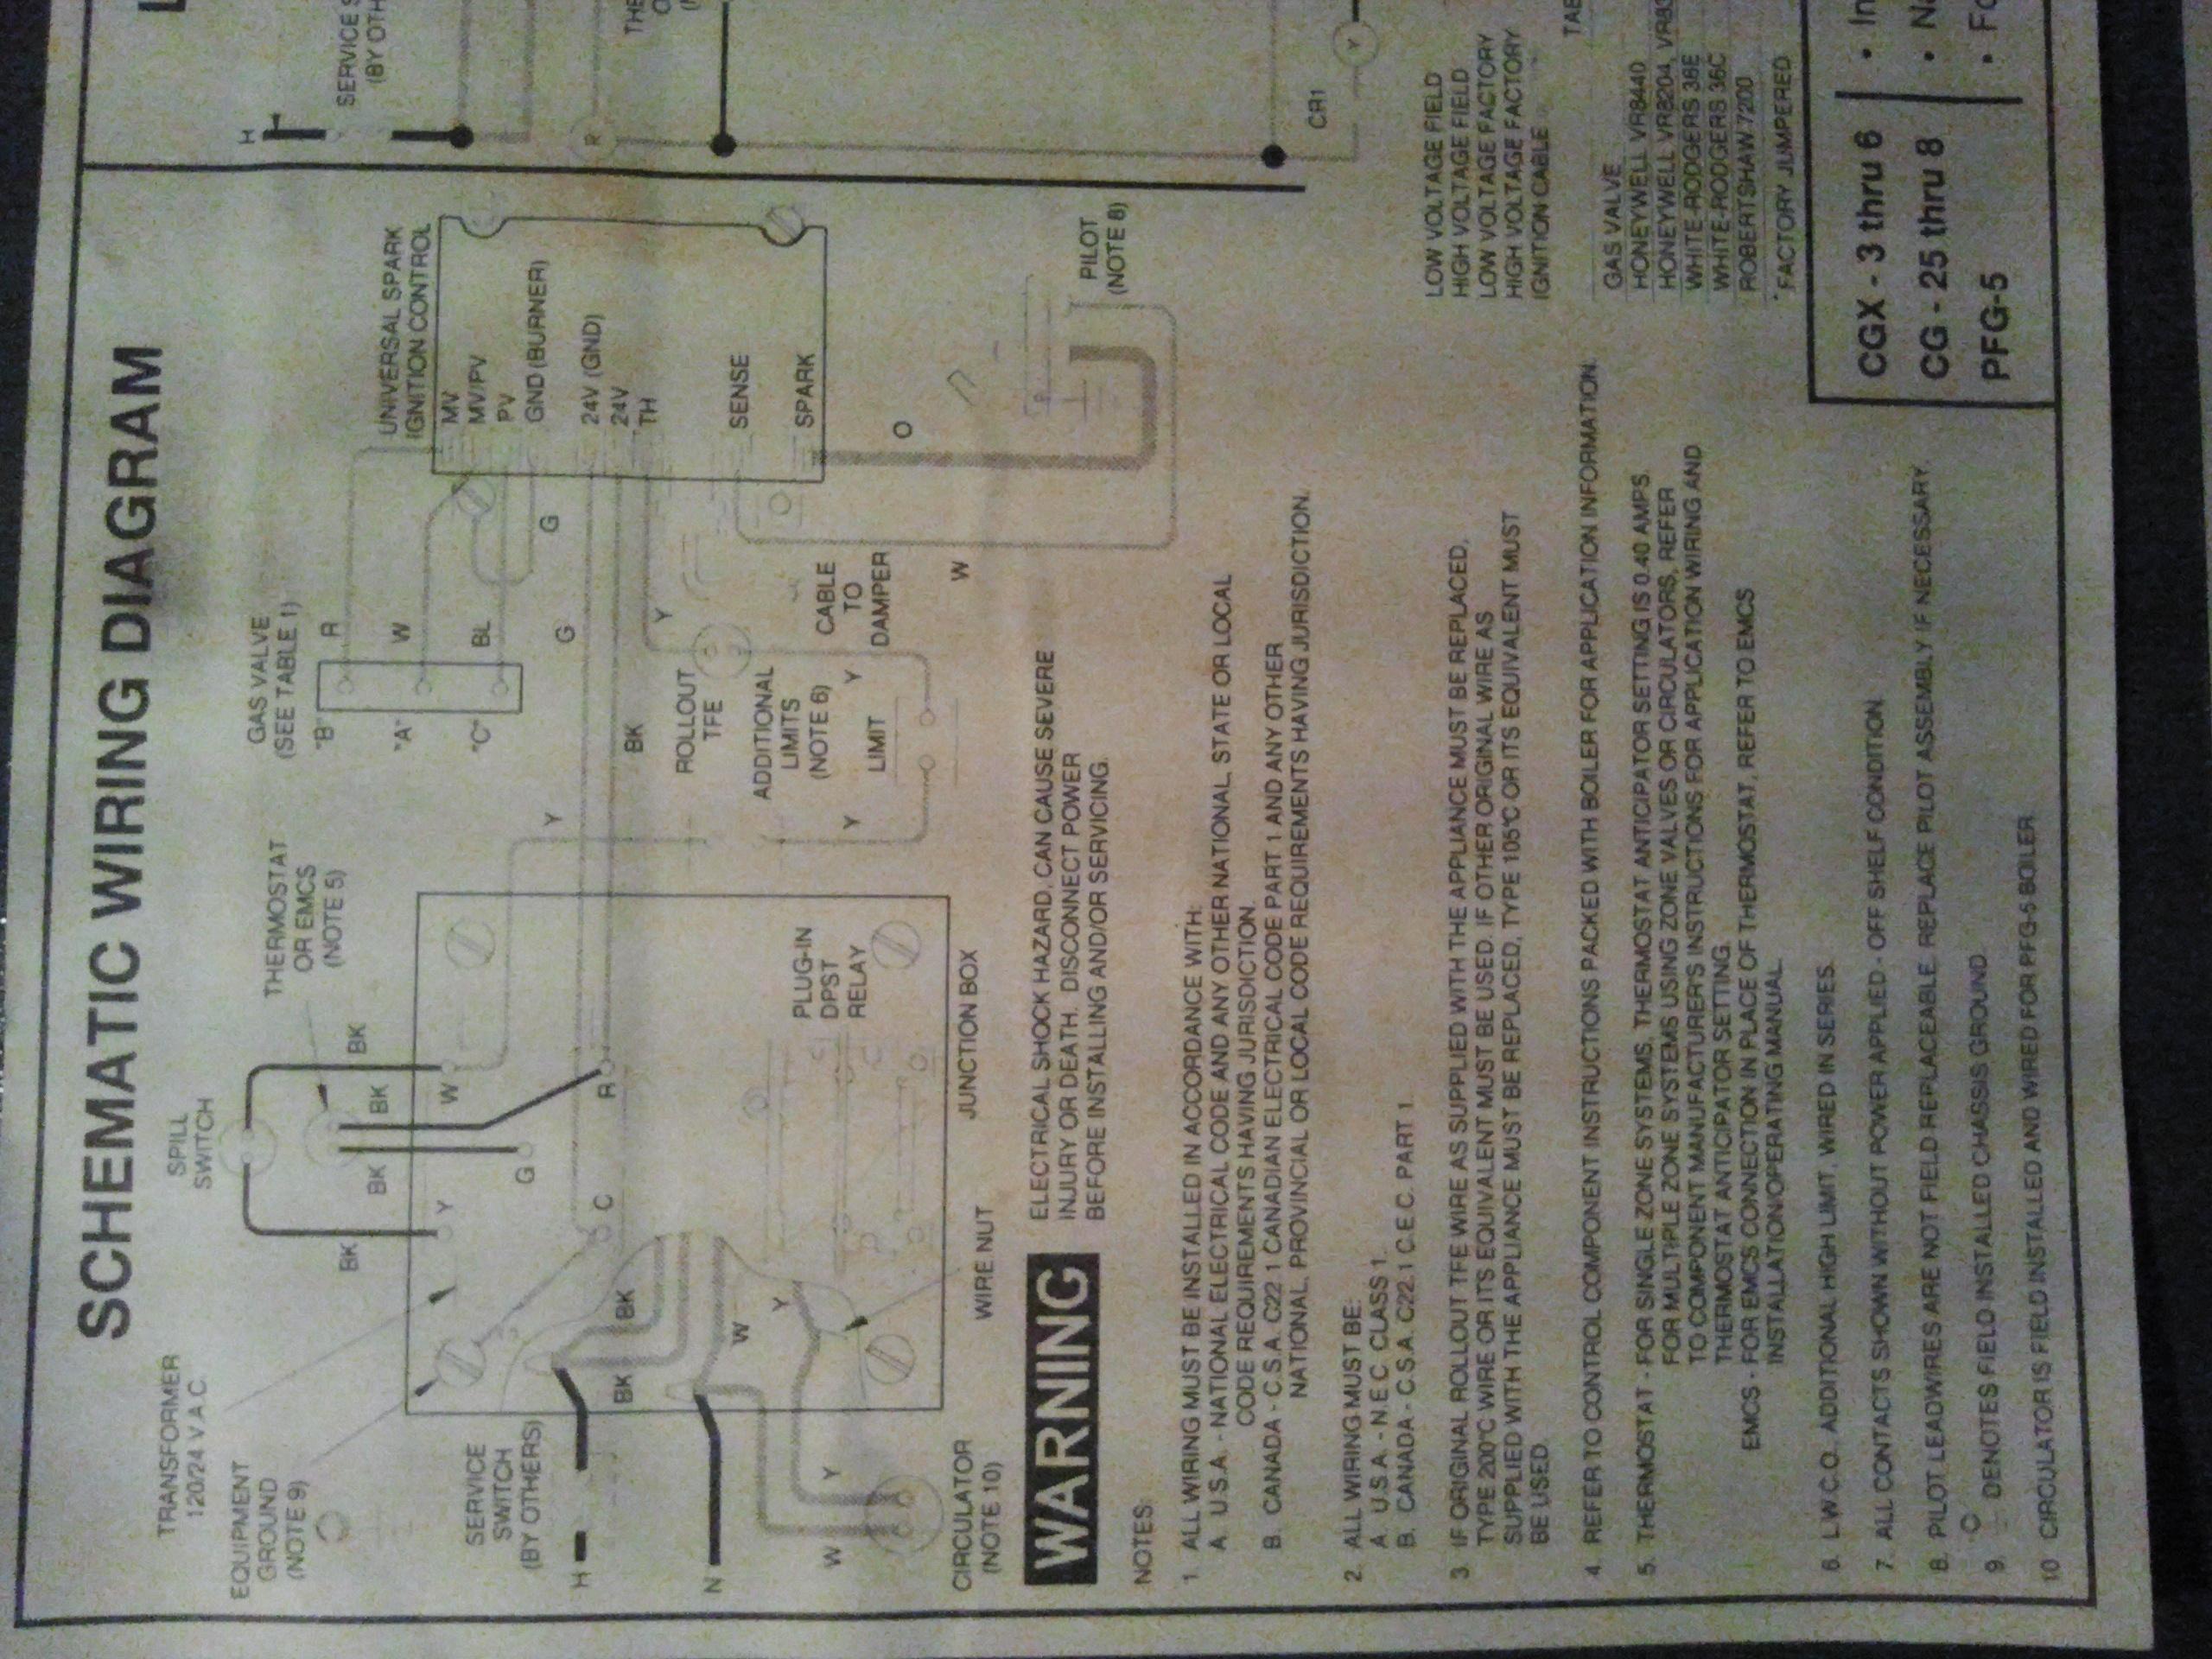 hi i have a weil mclain gas furnace that i installed in 1991. Black Bedroom Furniture Sets. Home Design Ideas